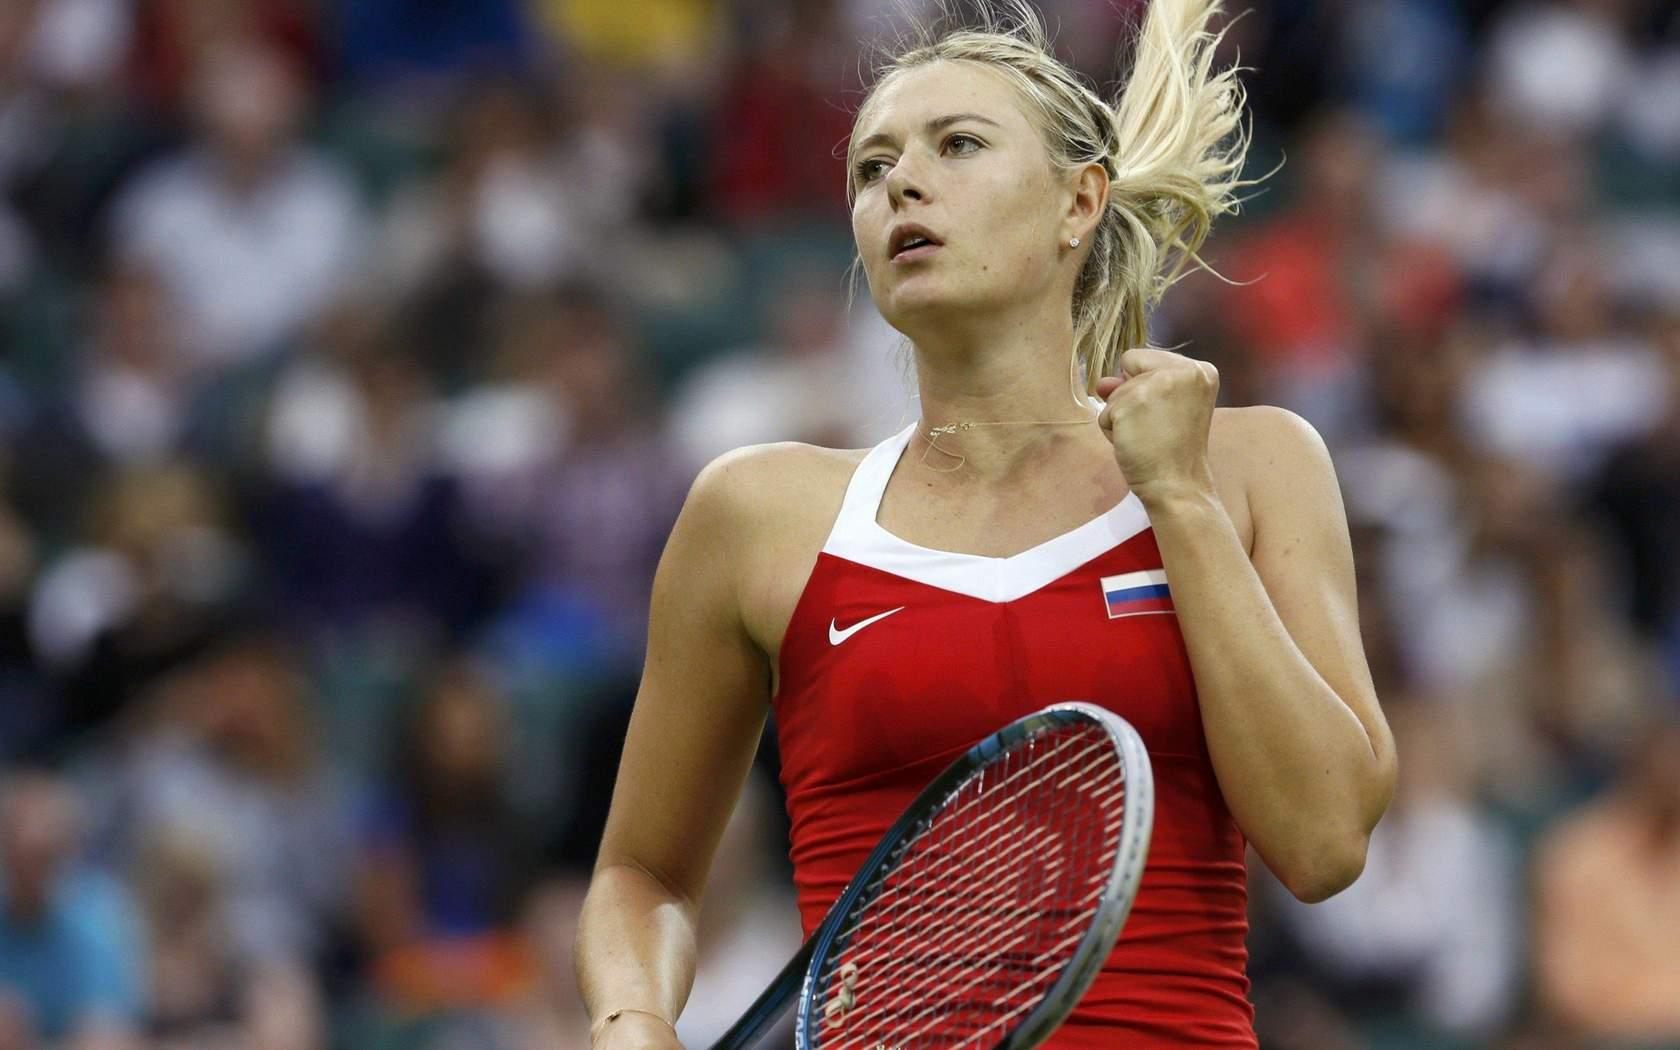 Maria-Sharapova-Tennis-Wallpaper